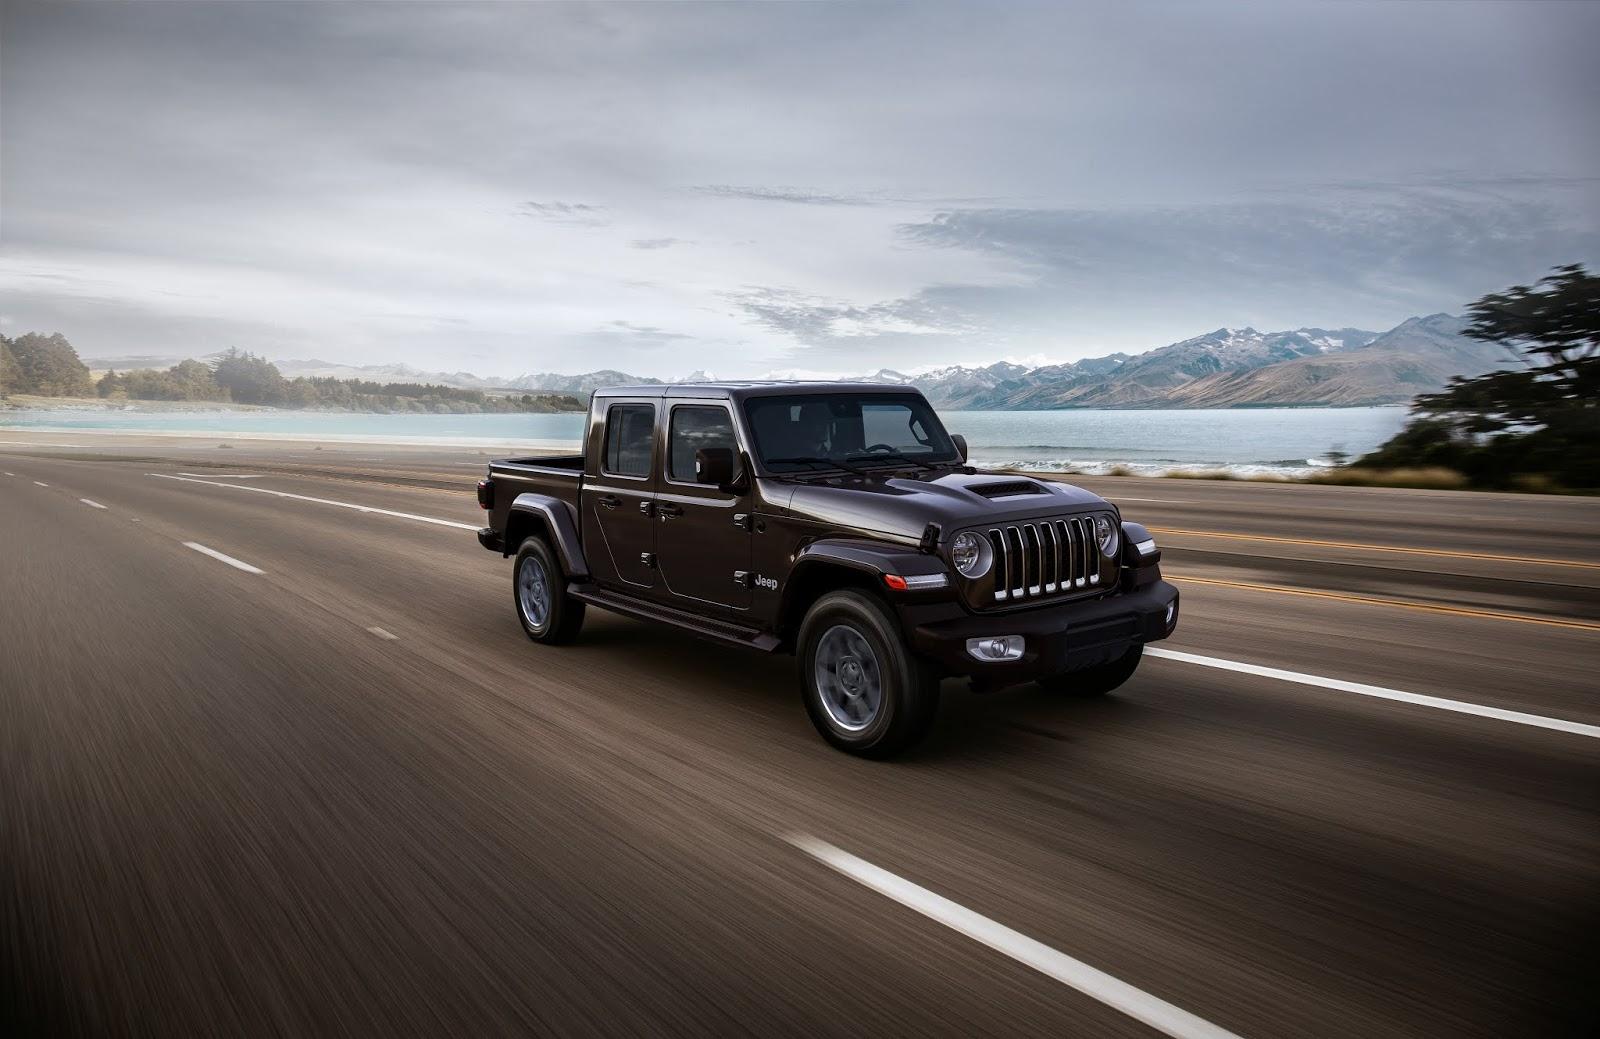 Overland To Jeep Gladiator, έρχεται να αλλάξει τα δεδομένα στην κατηγορία των pick-up Gladiator, Jeep, Jeep Gladiator, zblog, ειδήσεις